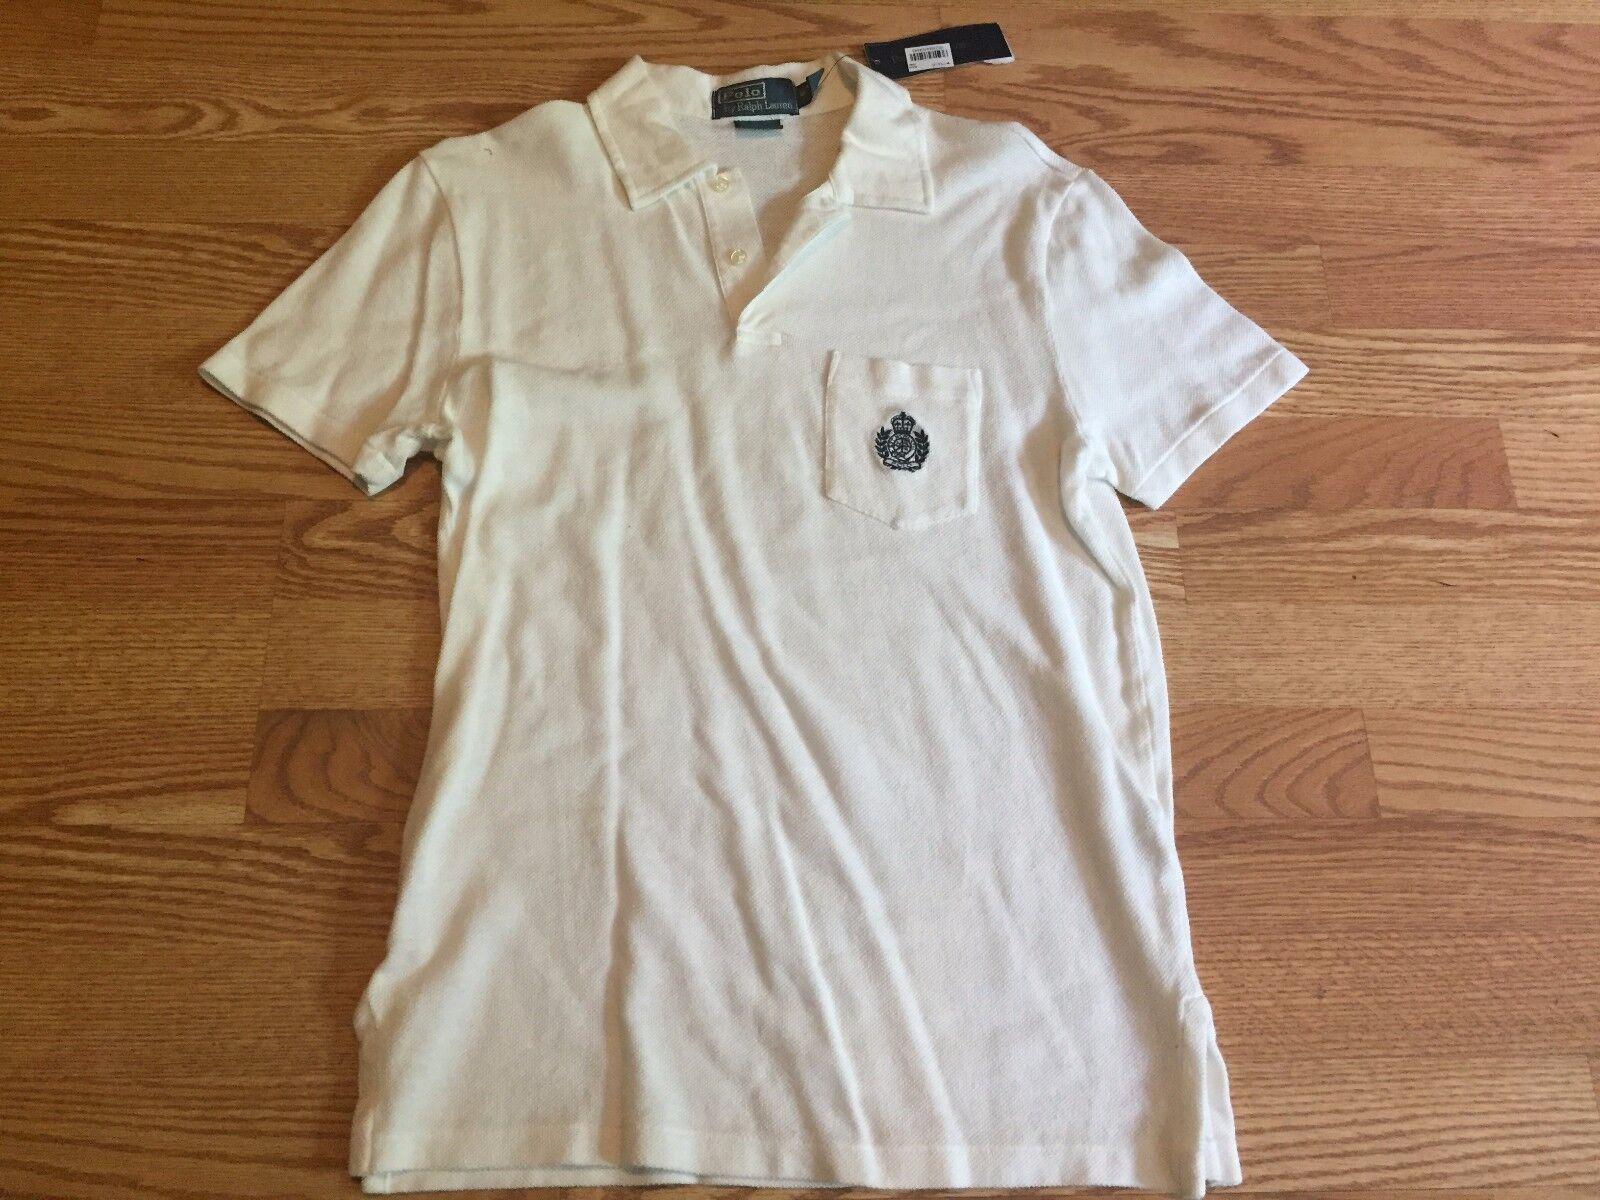 Polo Ralph Lauren white rare vintage crest rugby uniform shirt linen S XL XXL